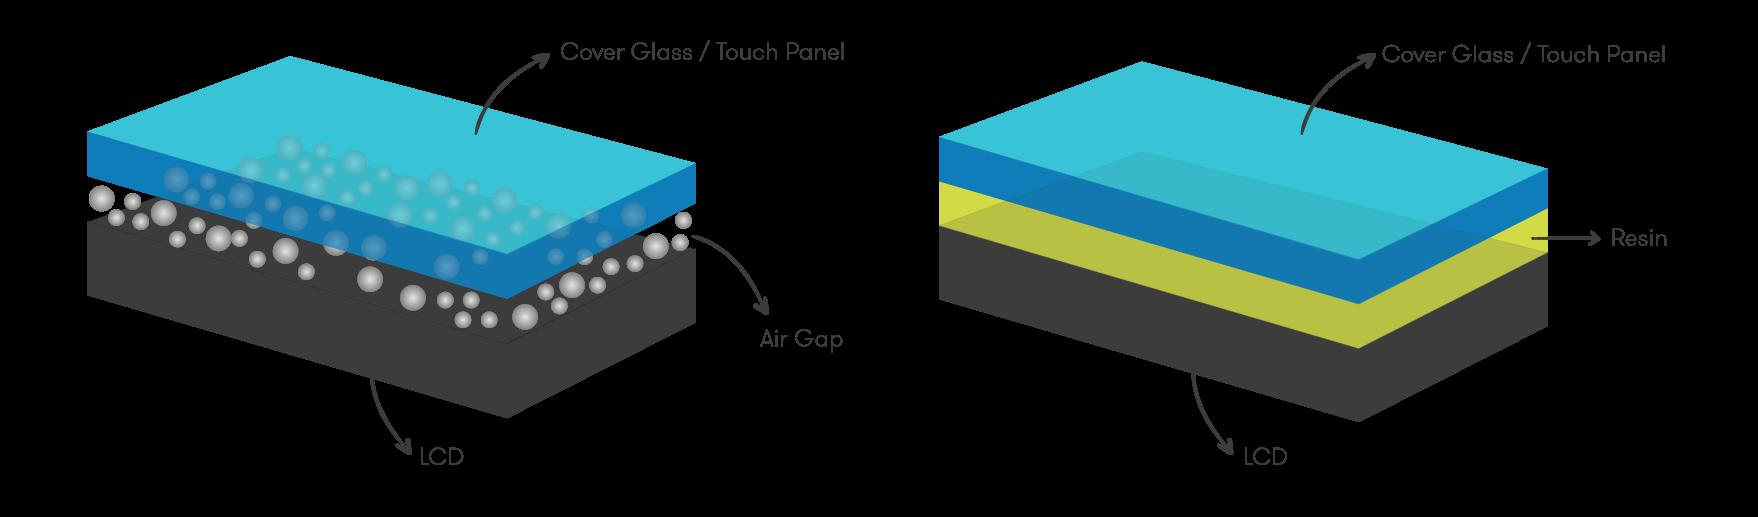 Optical Bonding Compatible